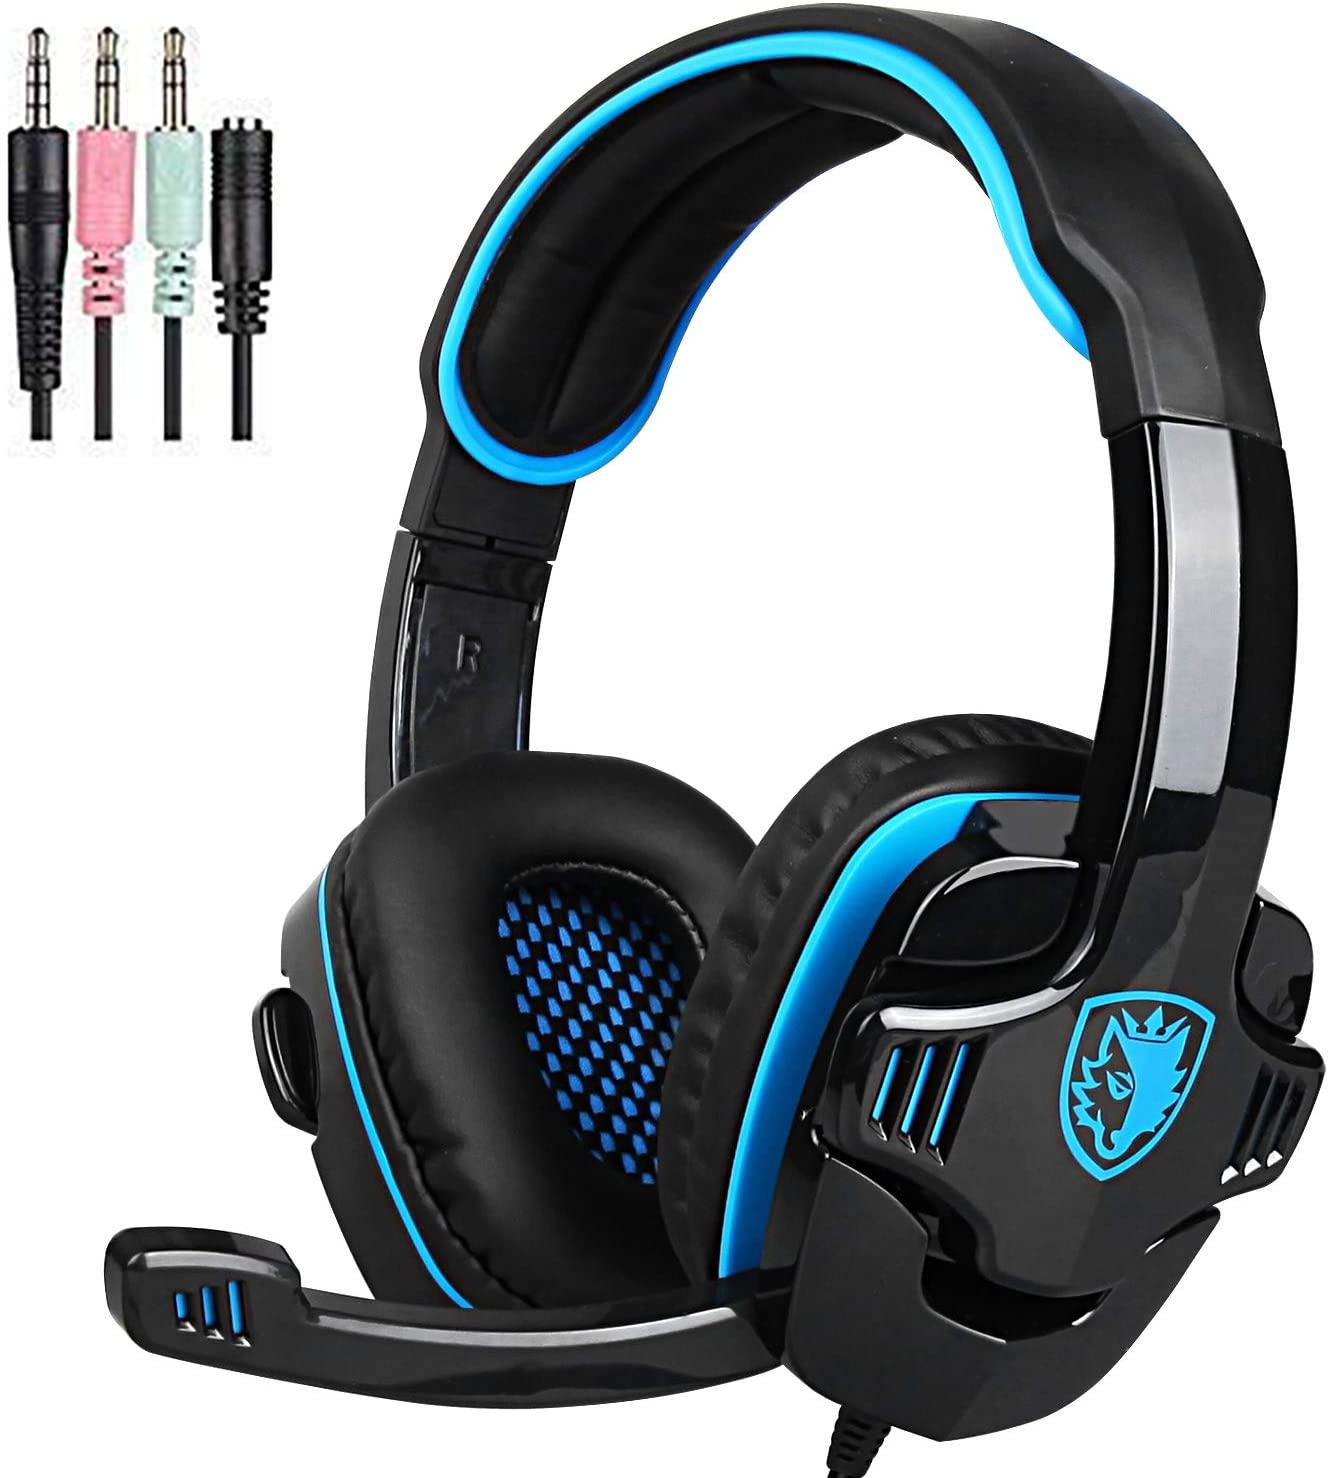 Stereo Gaming Headphone, SADES SA708GT Headset Earphone with Microphone (Black/Blue)